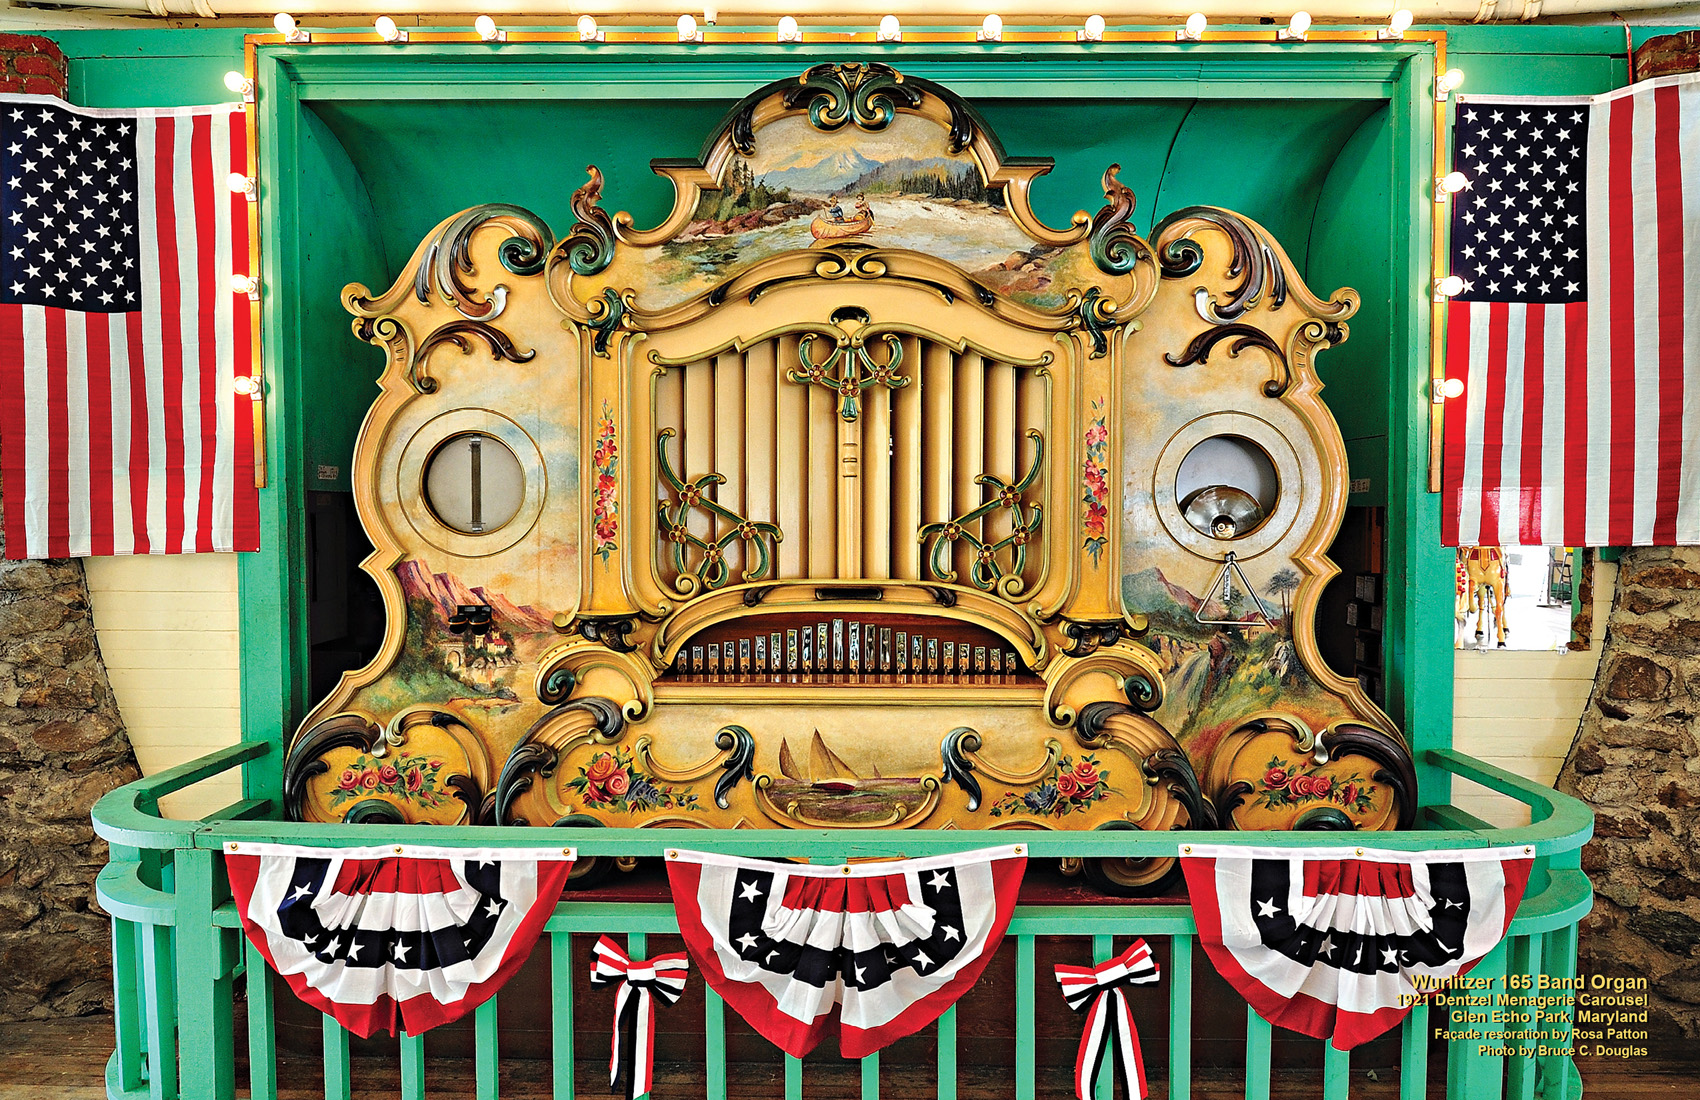 Wurlitzer-165-Band-Organ-Glen-Echo-CNT-center-Oct_11